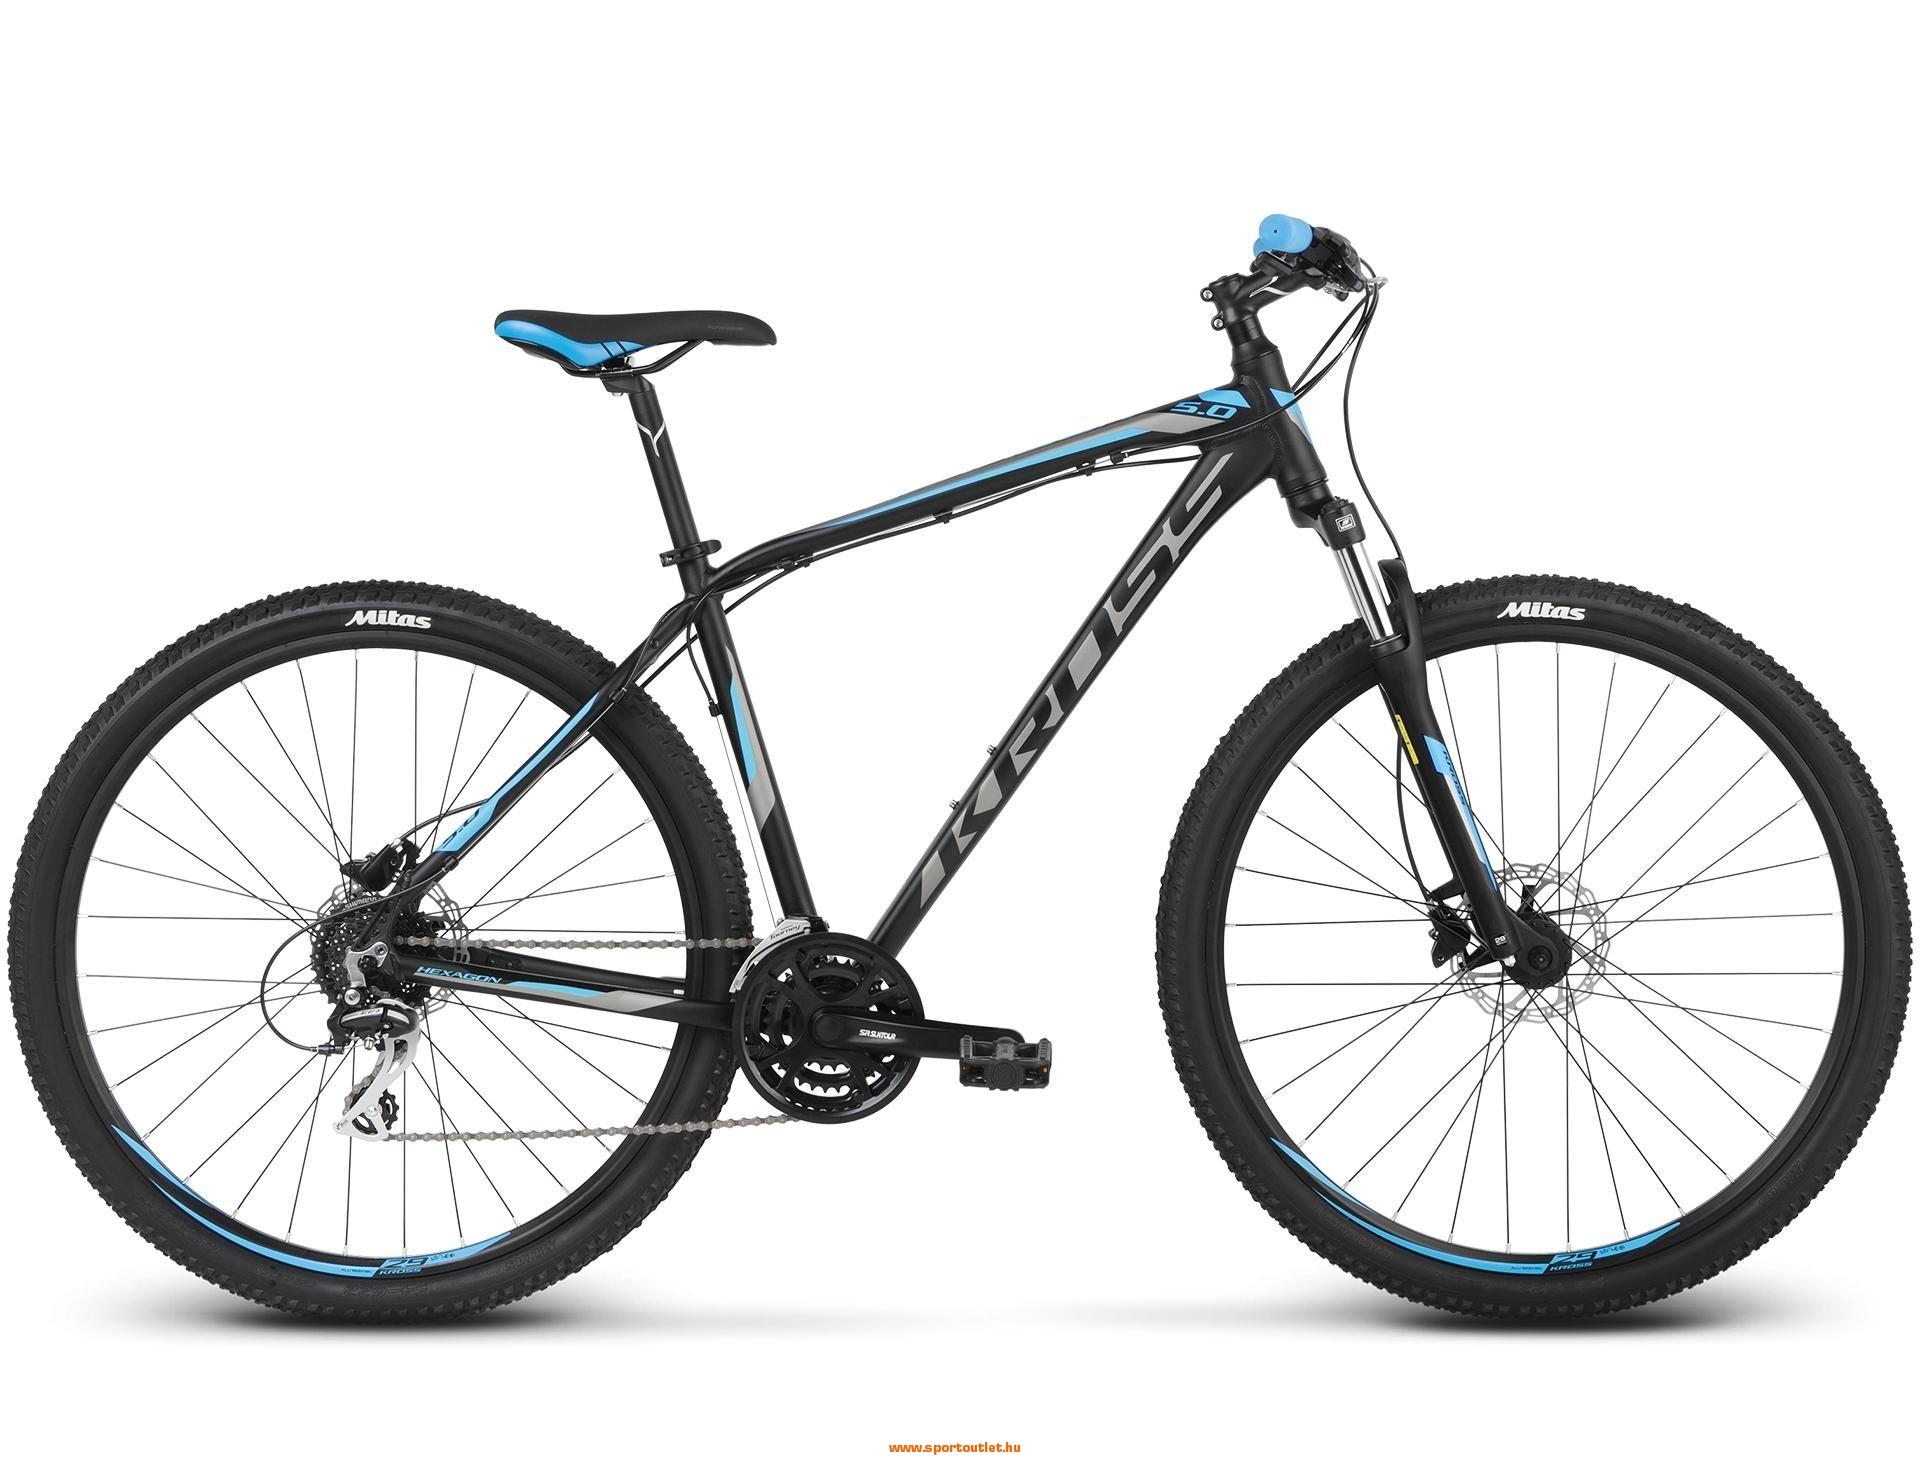 Kross hexagon 5.0 kerékpár